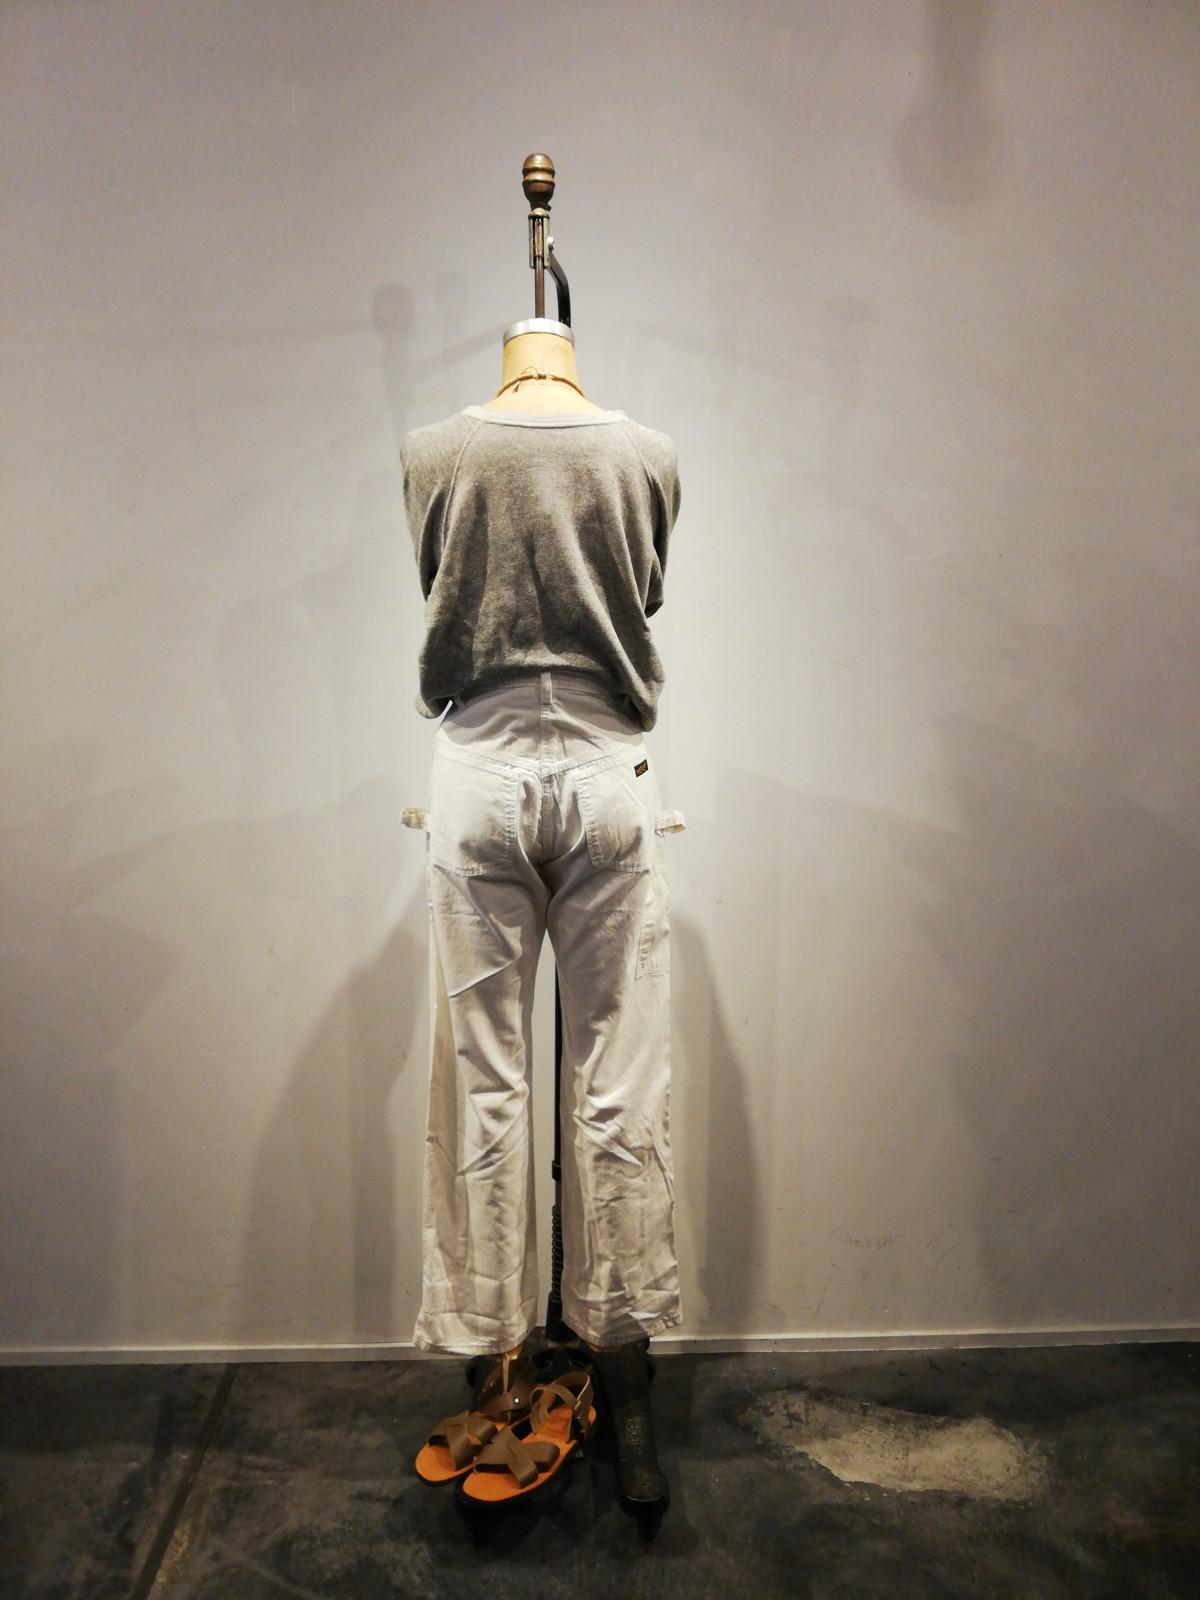 DEECEE,painter pants,USA,